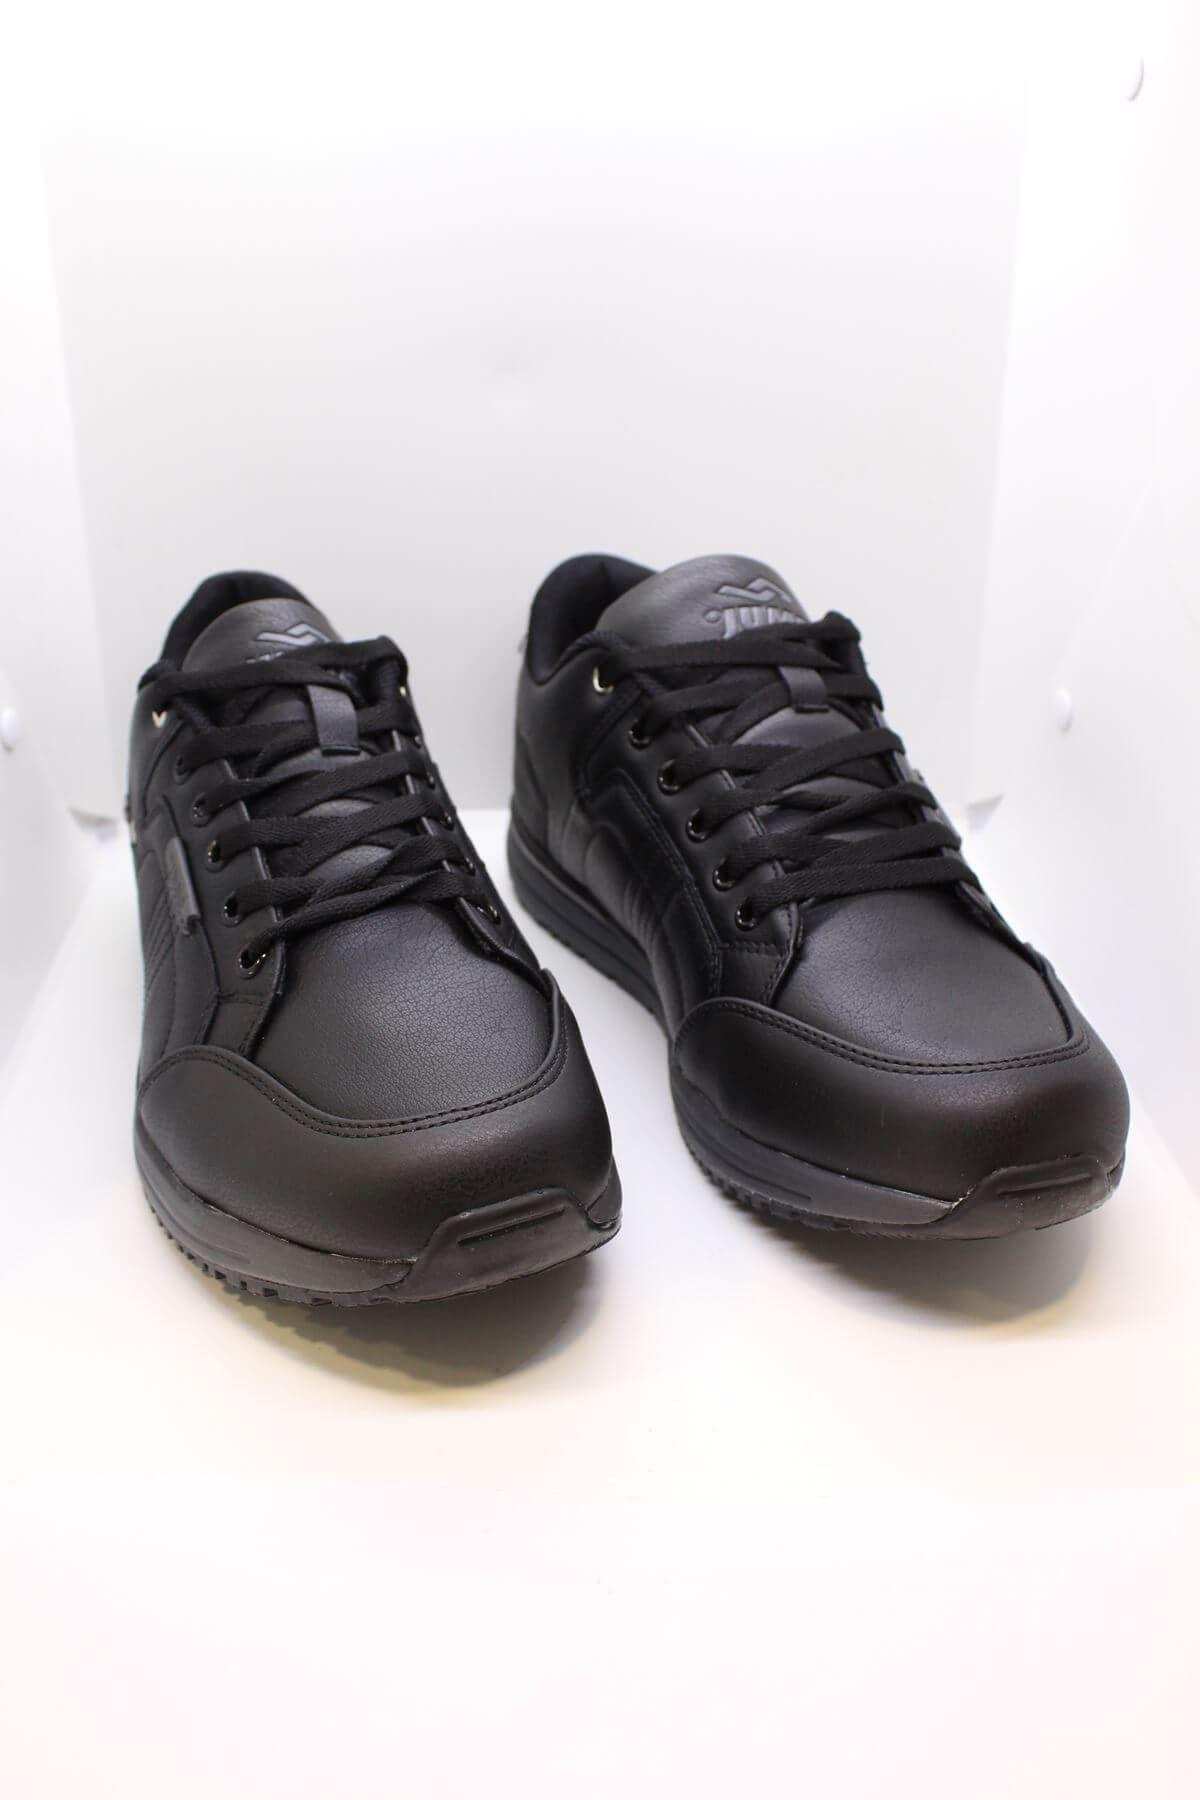 Jump Airflow 24023 Siyah  Erkek Spor Ayakkabı